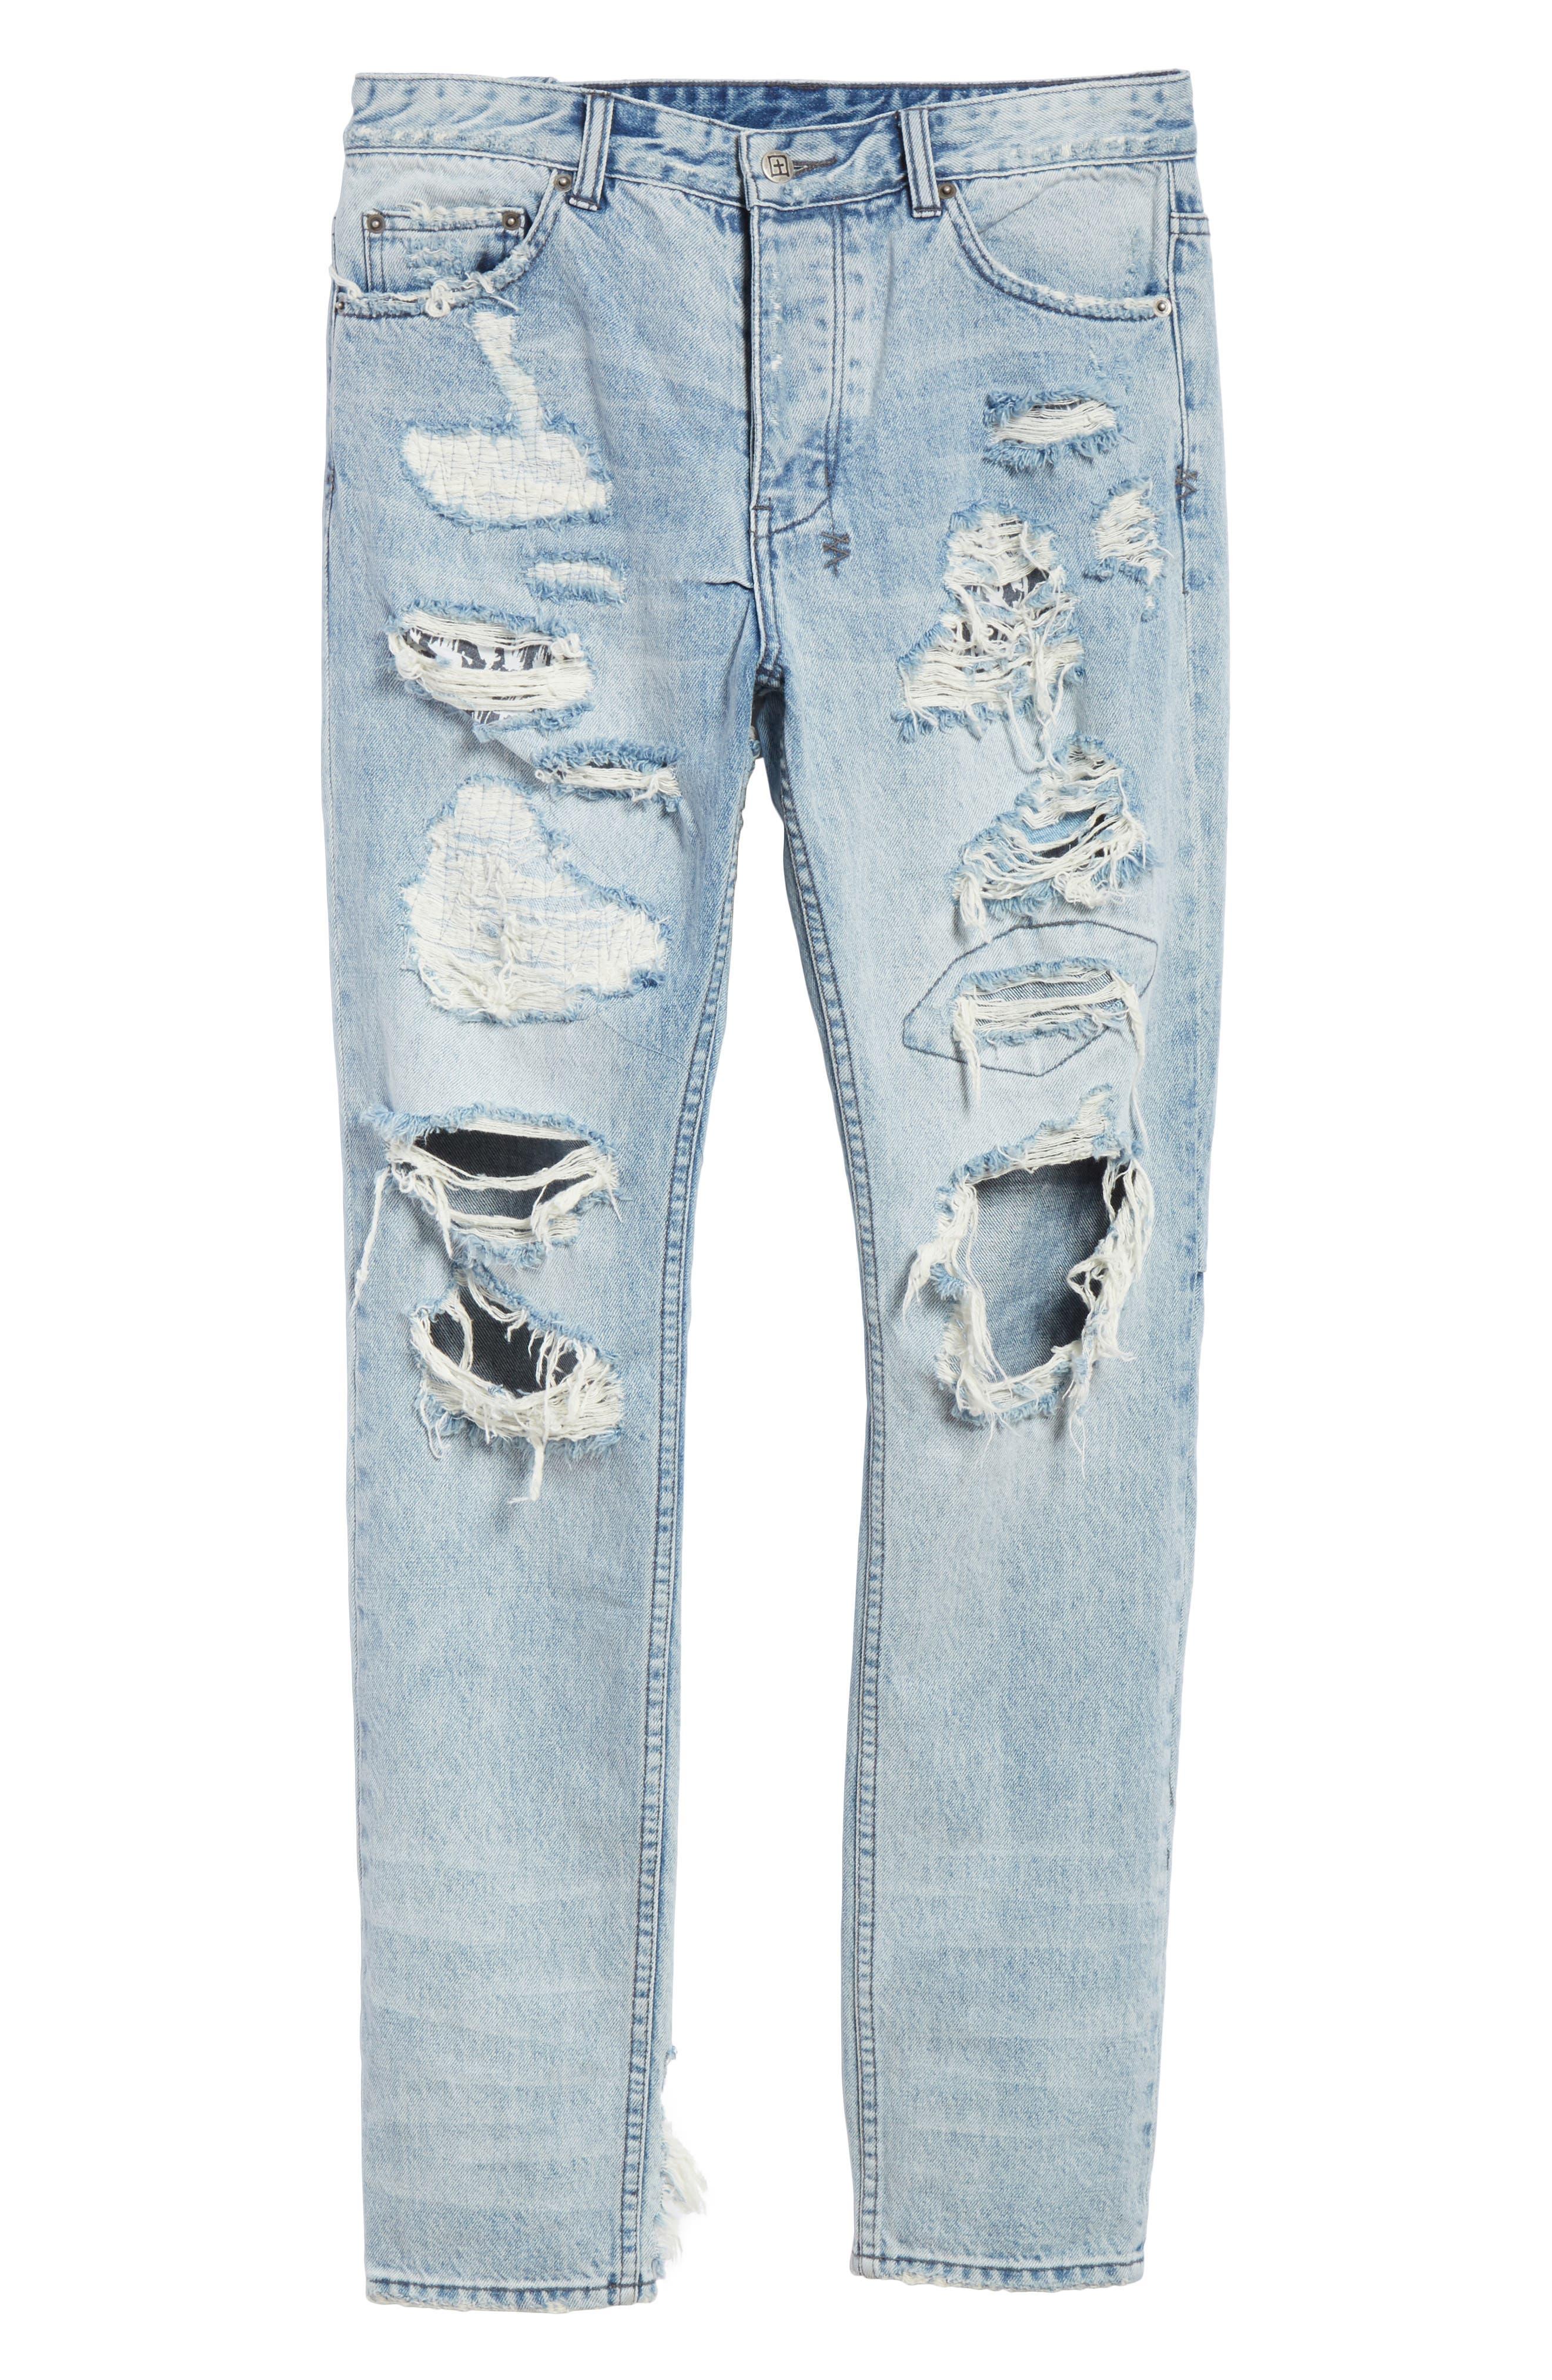 Chitch Tropo Trash Jeans,                             Alternate thumbnail 6, color,                             400